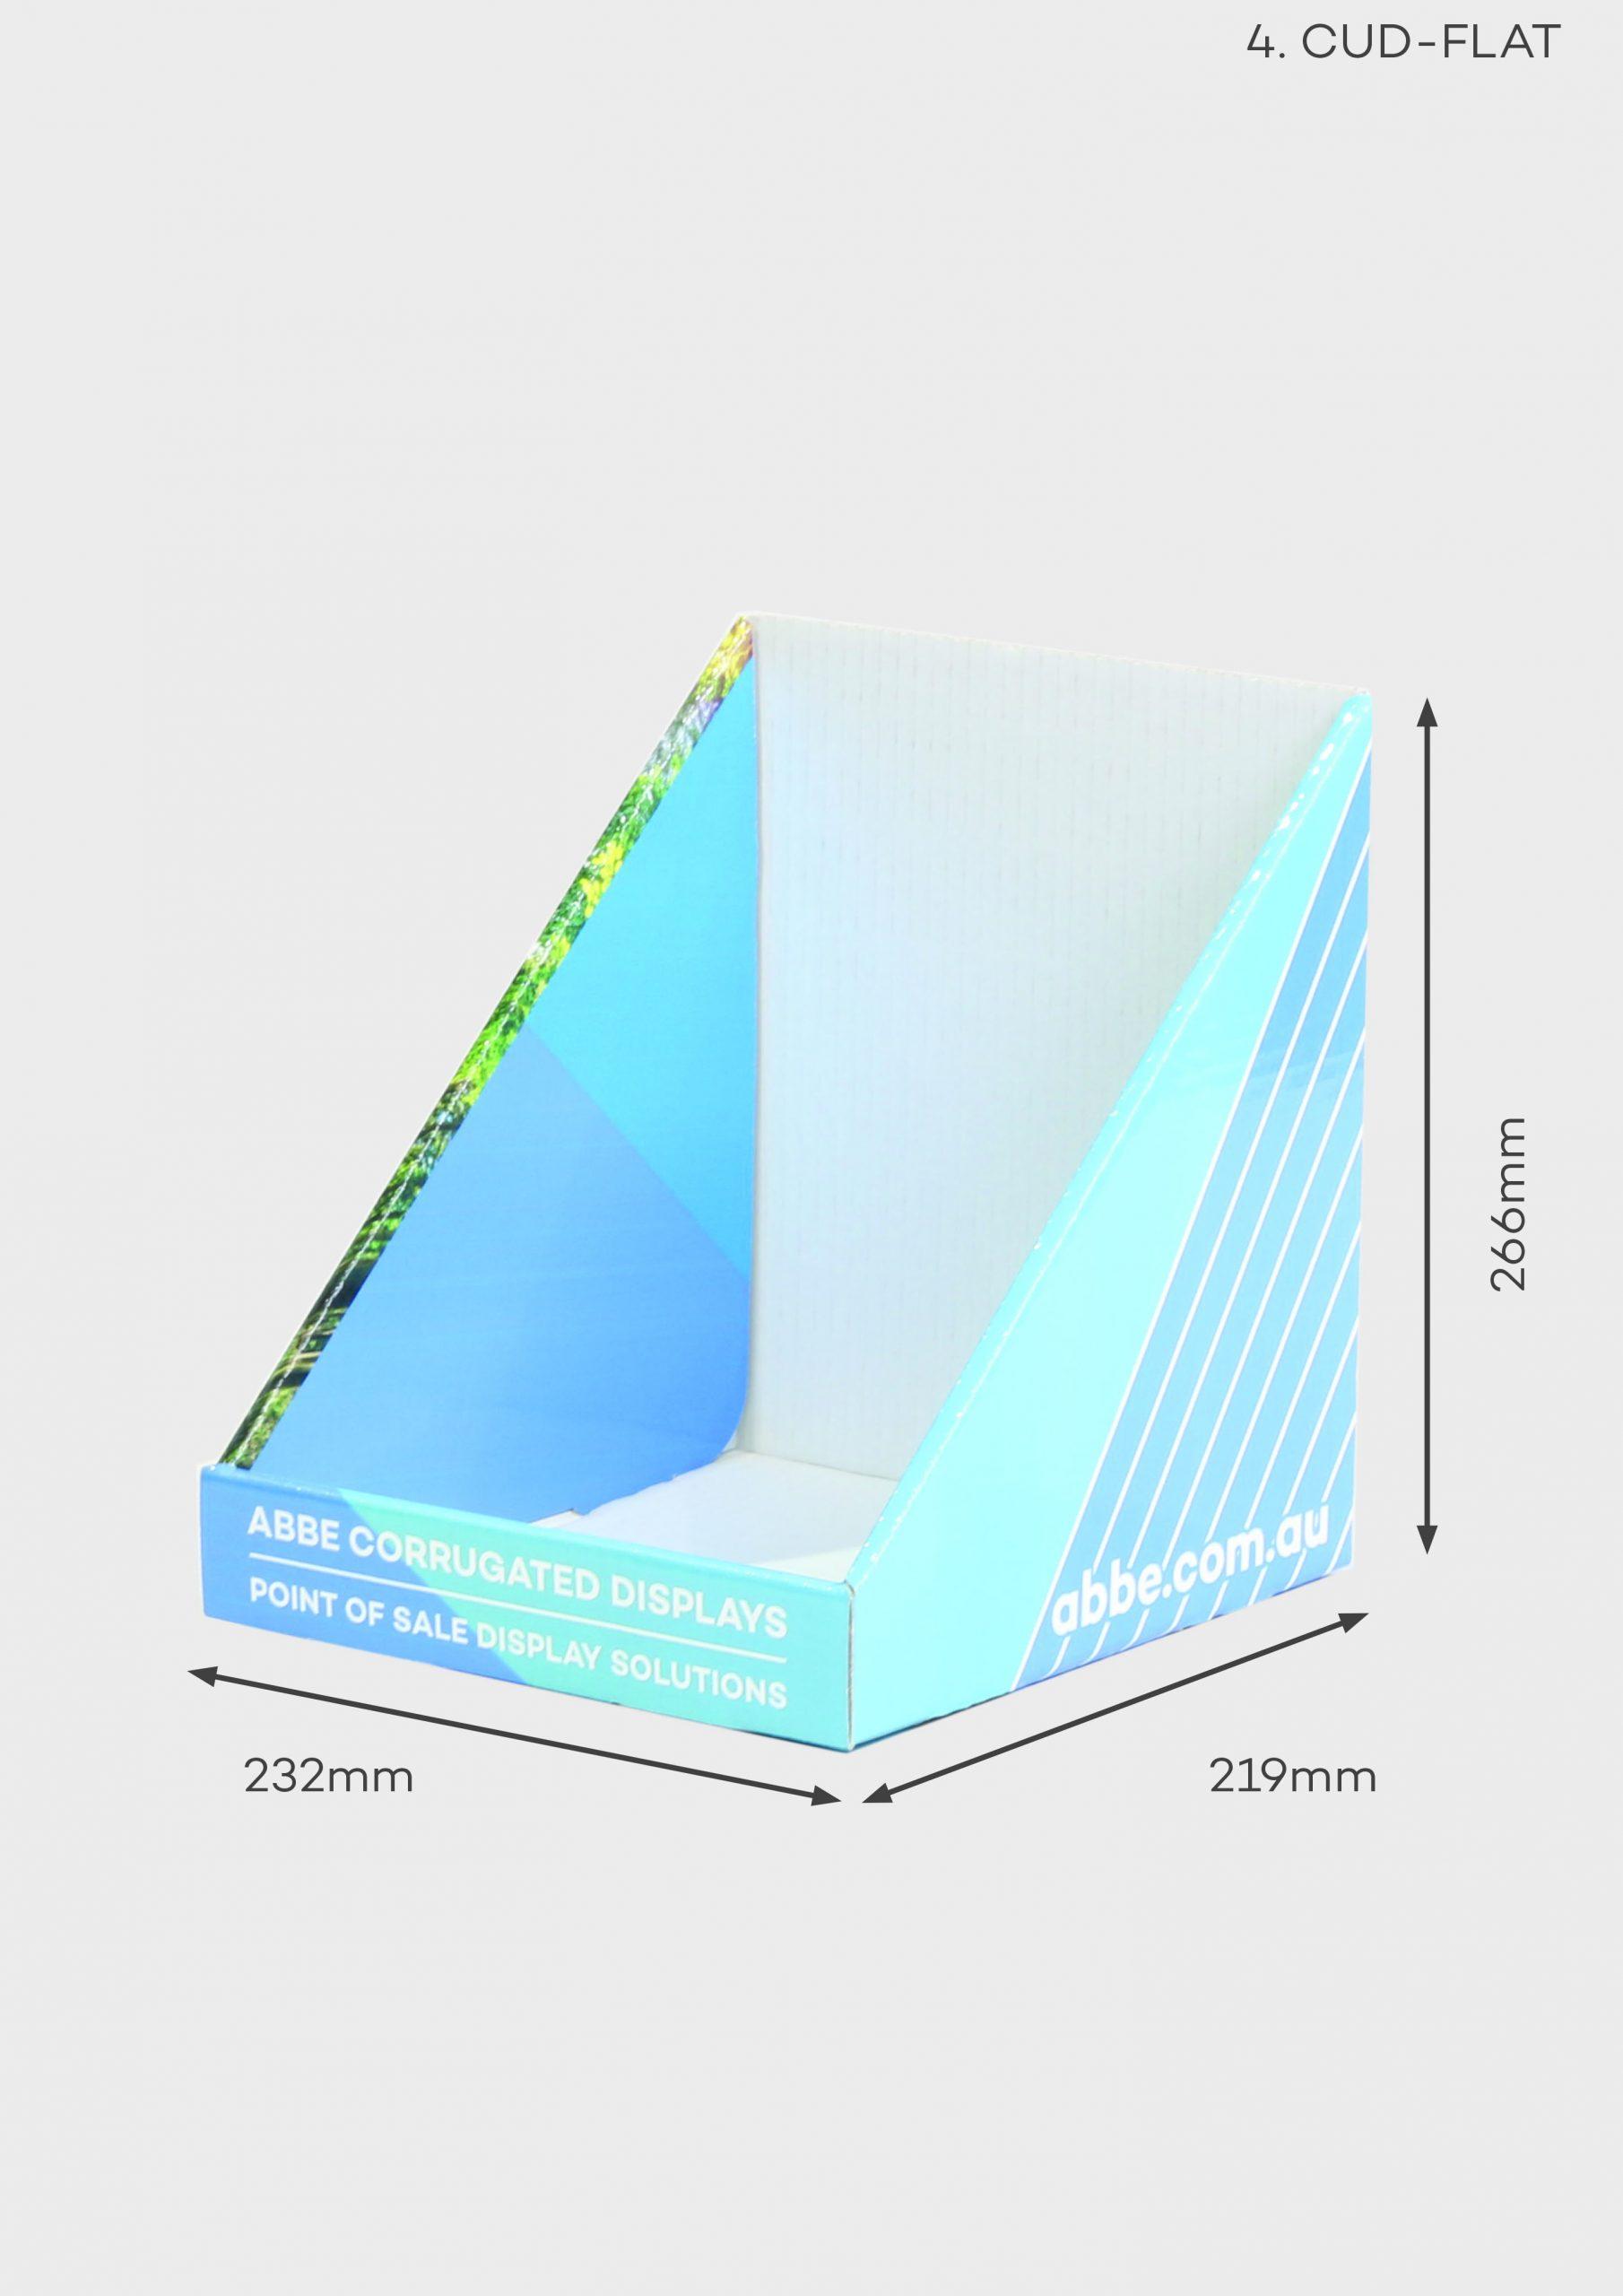 Small Counter Display (Ref CUD-FLAT)